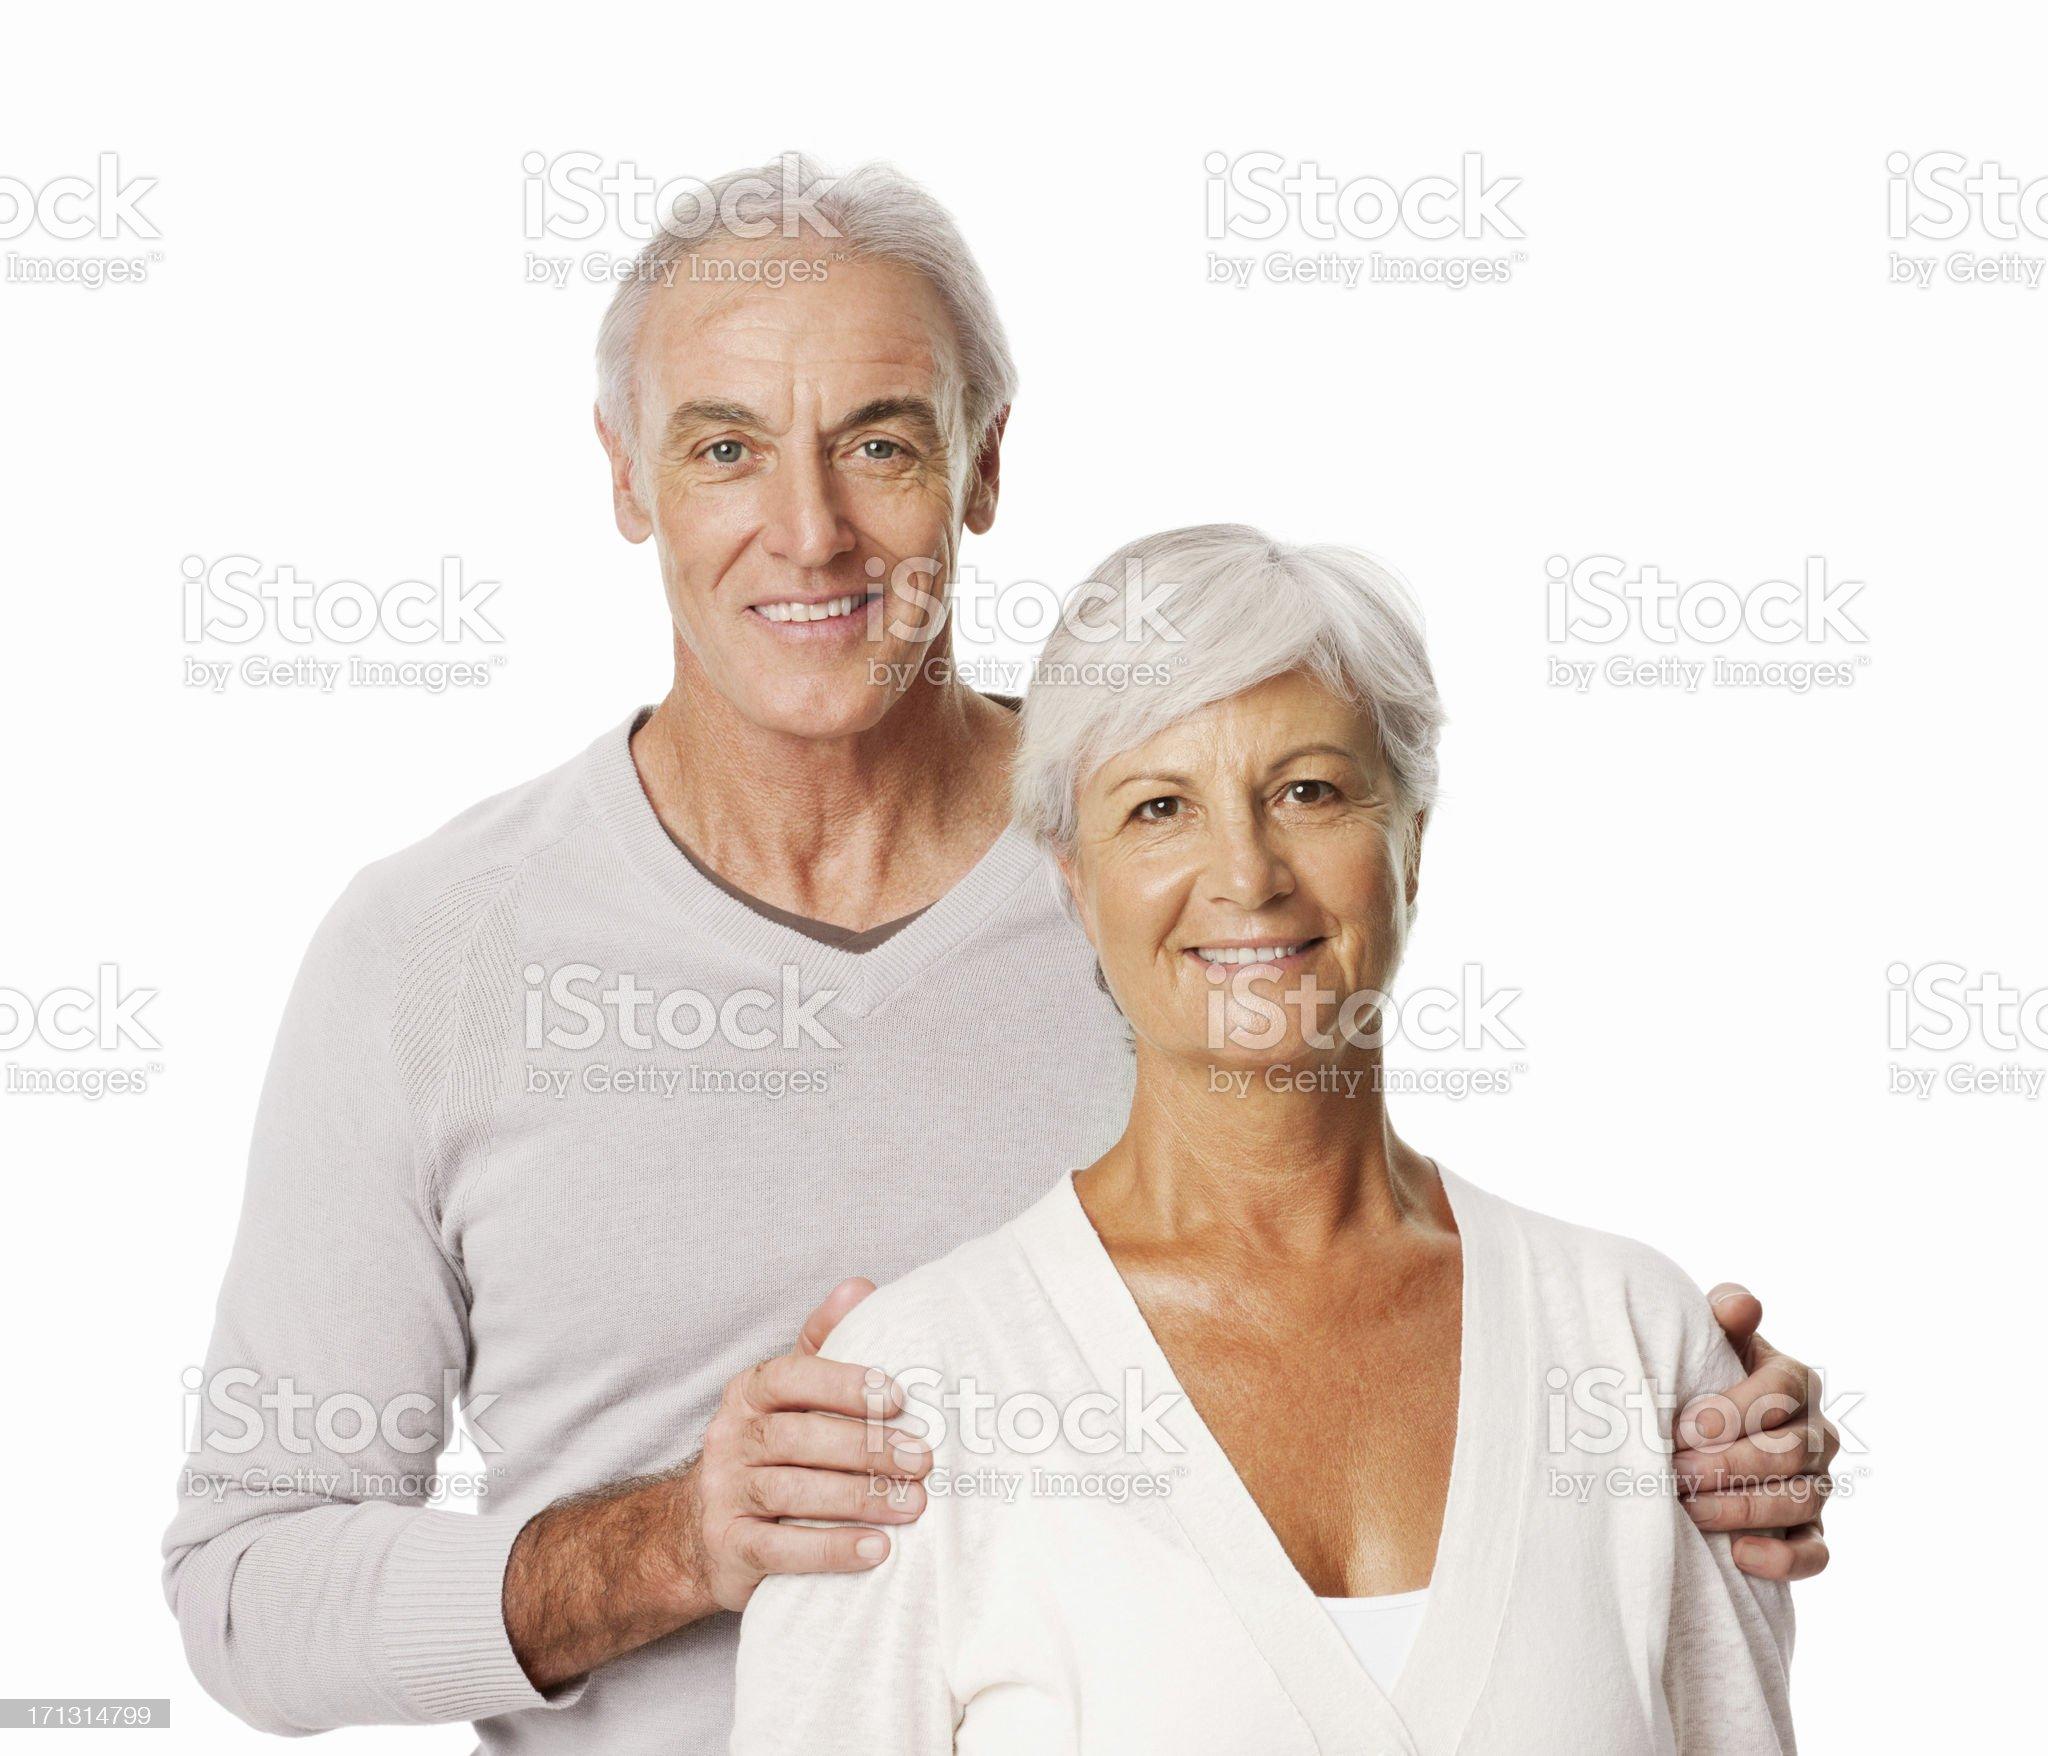 Happy Senior Couple Posing - Isolated royalty-free stock photo